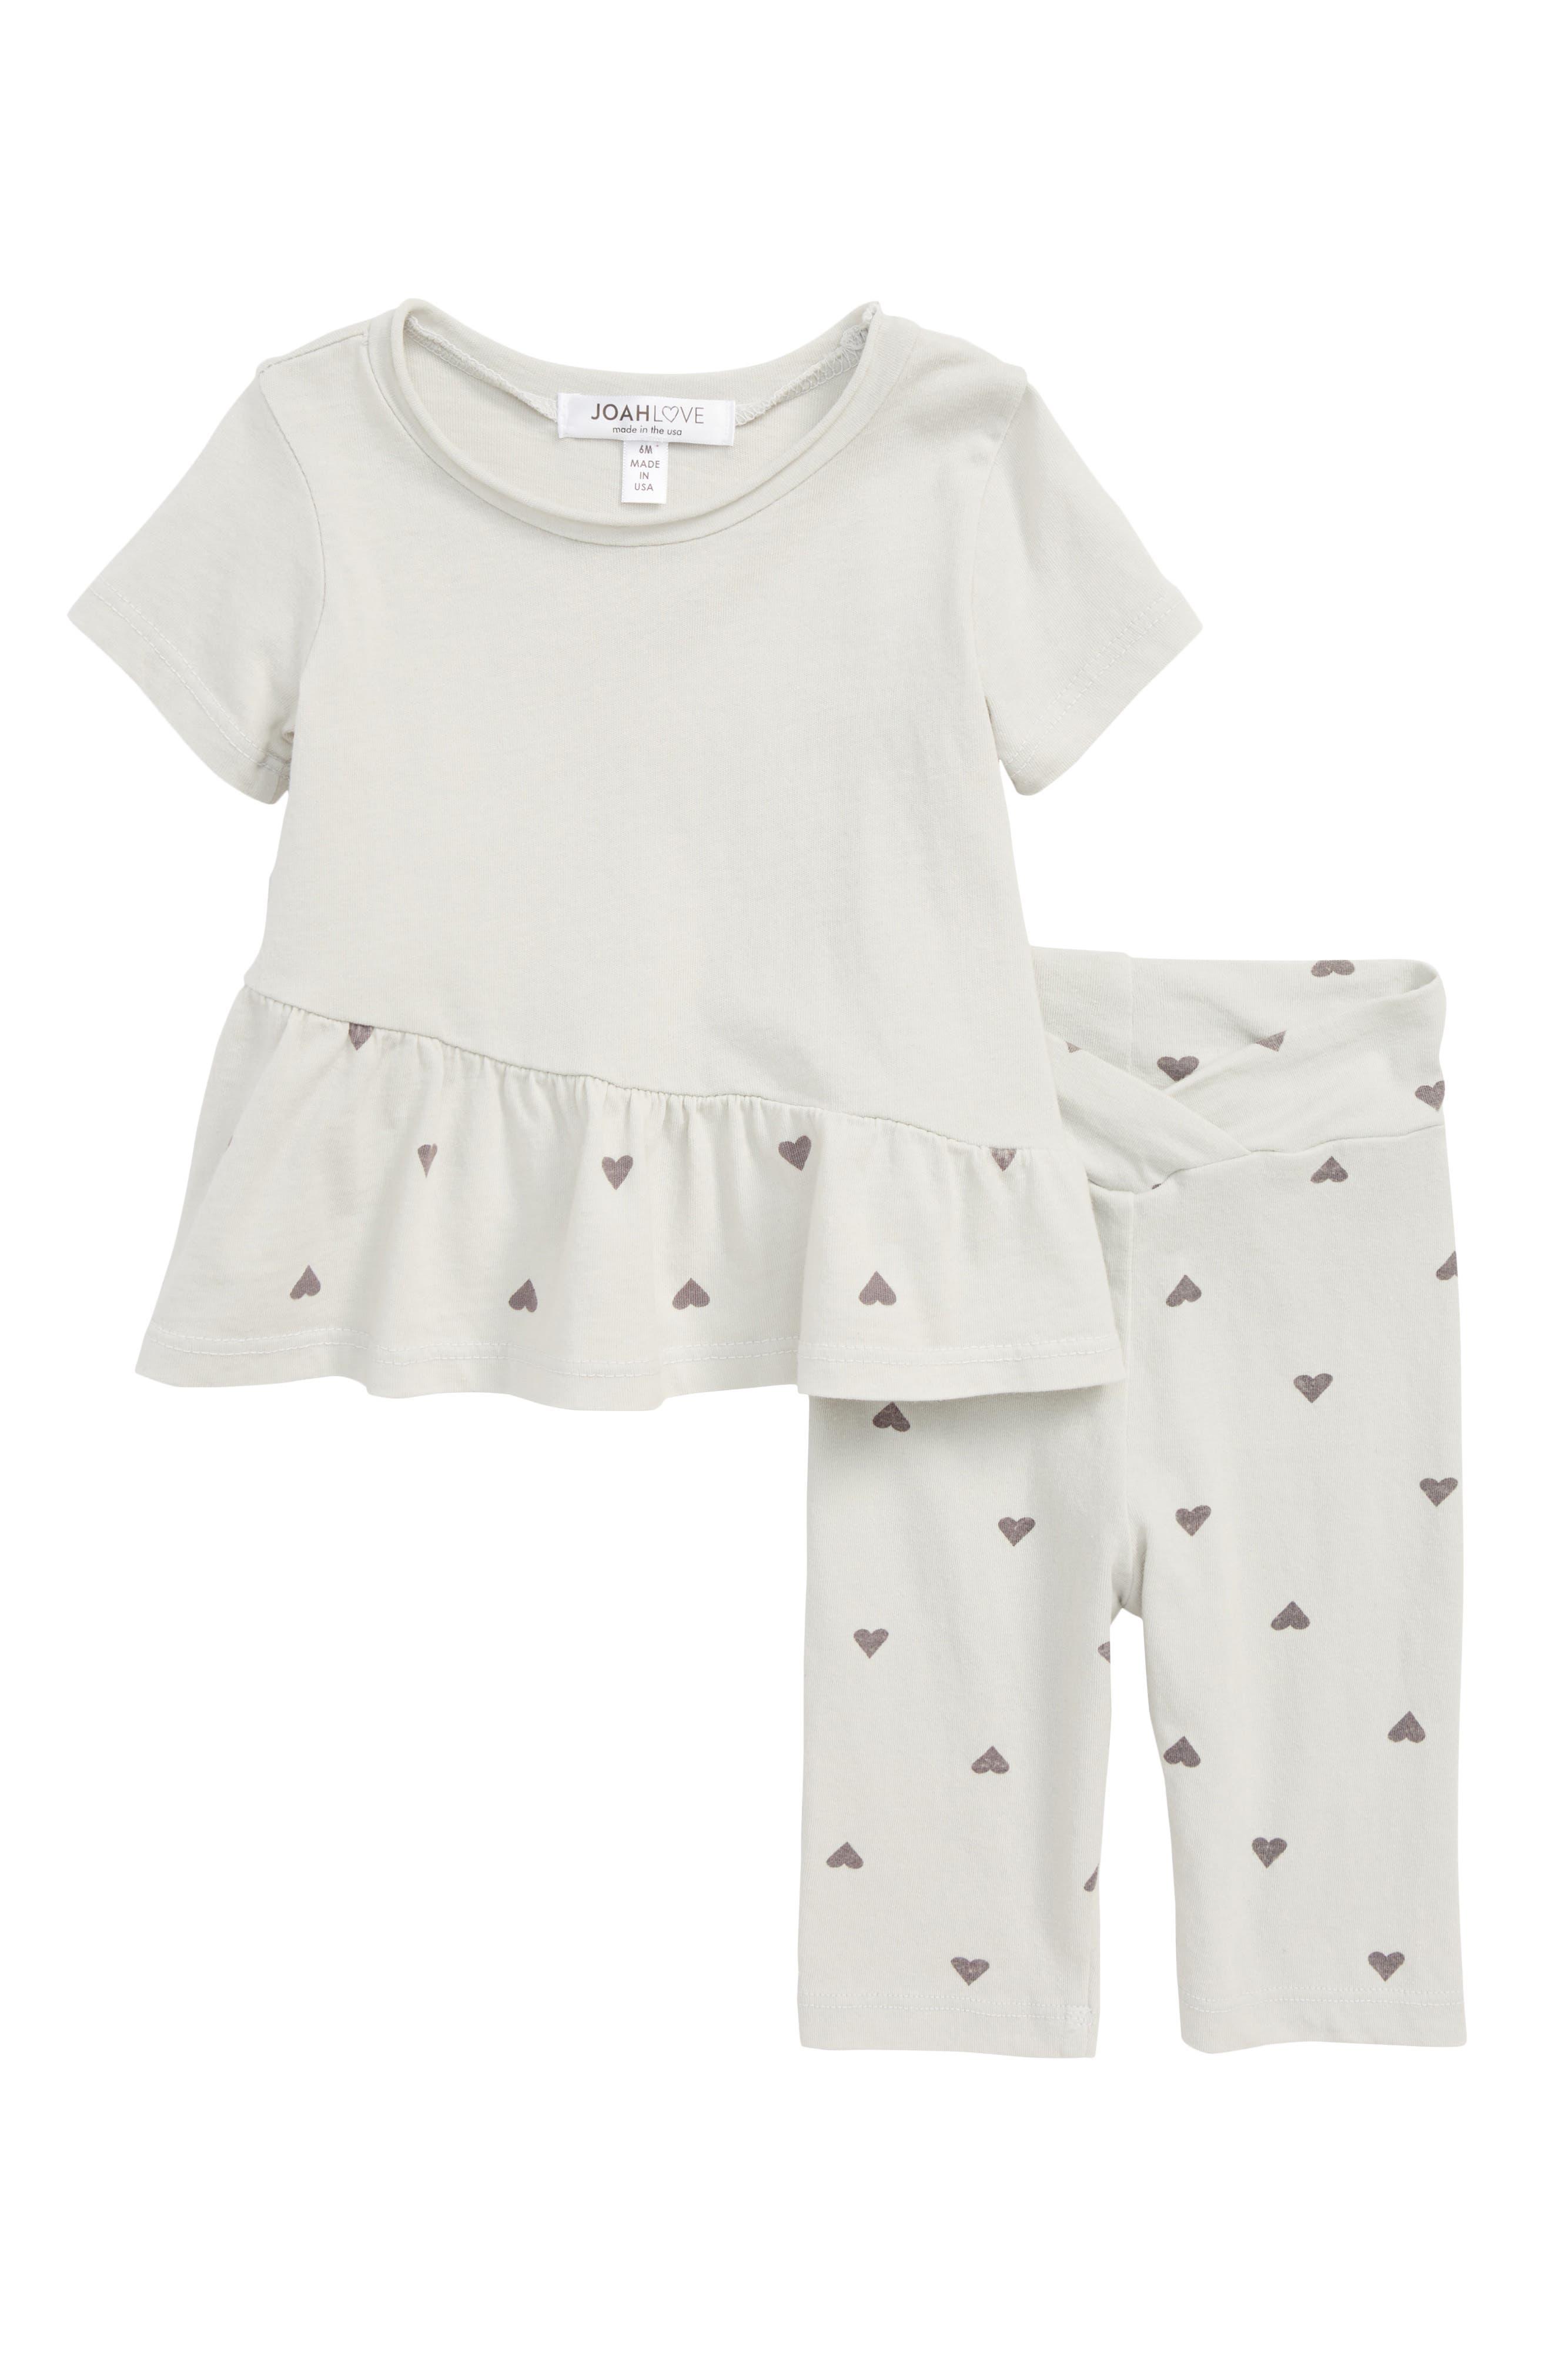 Joah Heart Print Top & Leggings Set (Baby Girls)